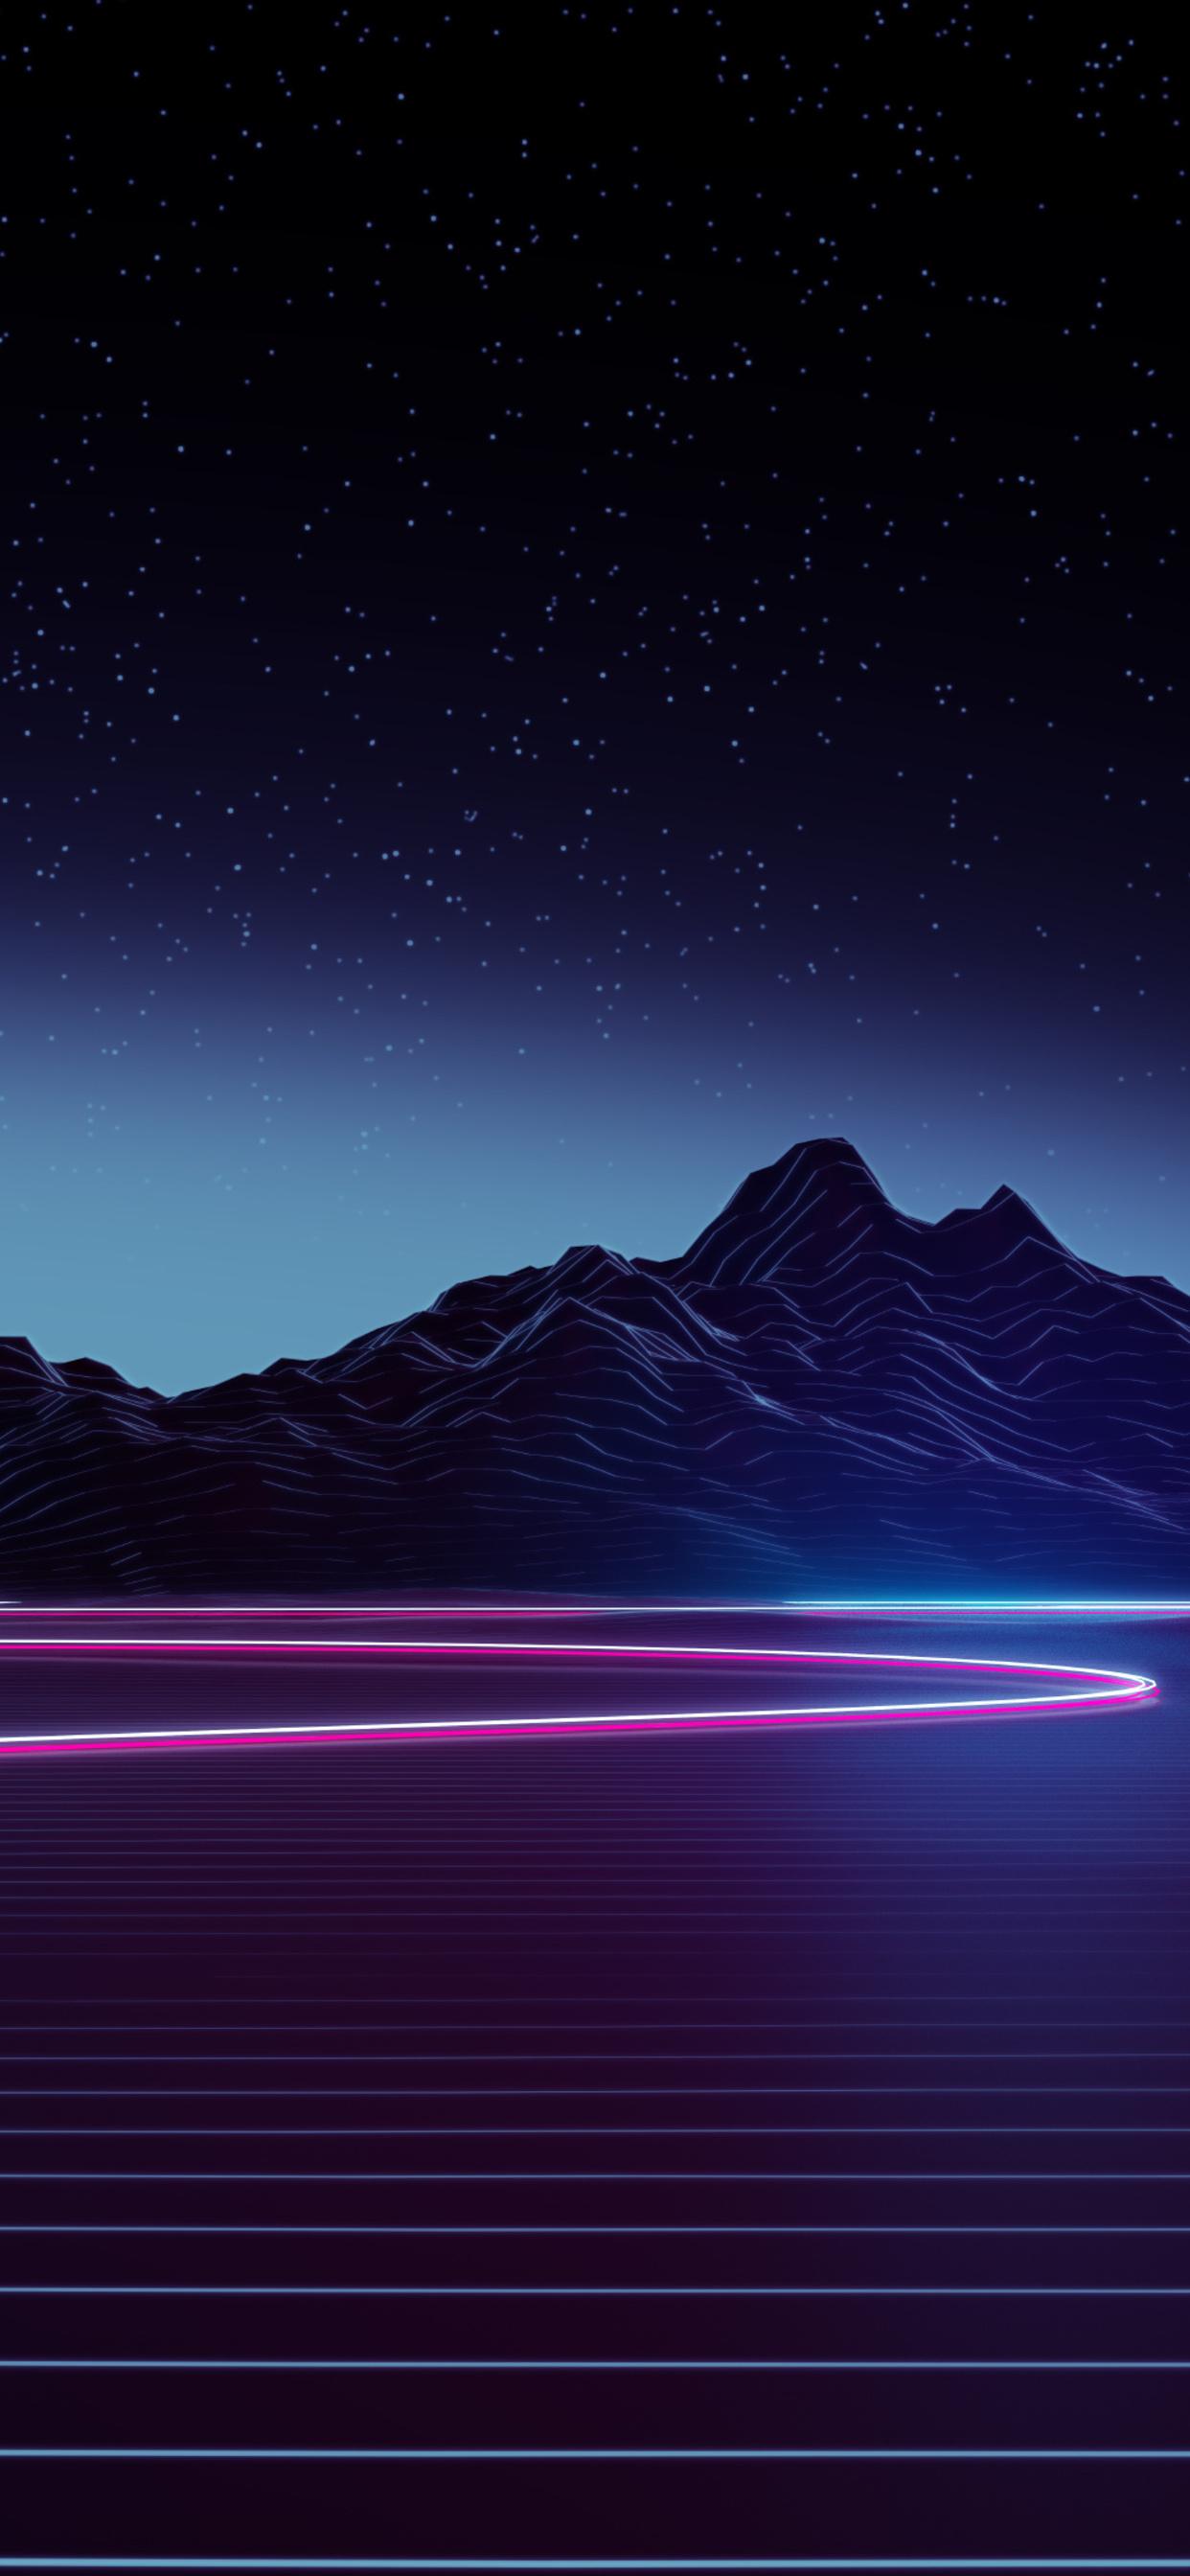 1242x2688 Neon Highway 4k Iphone Xs Max Hd 4k Wallpapers Images